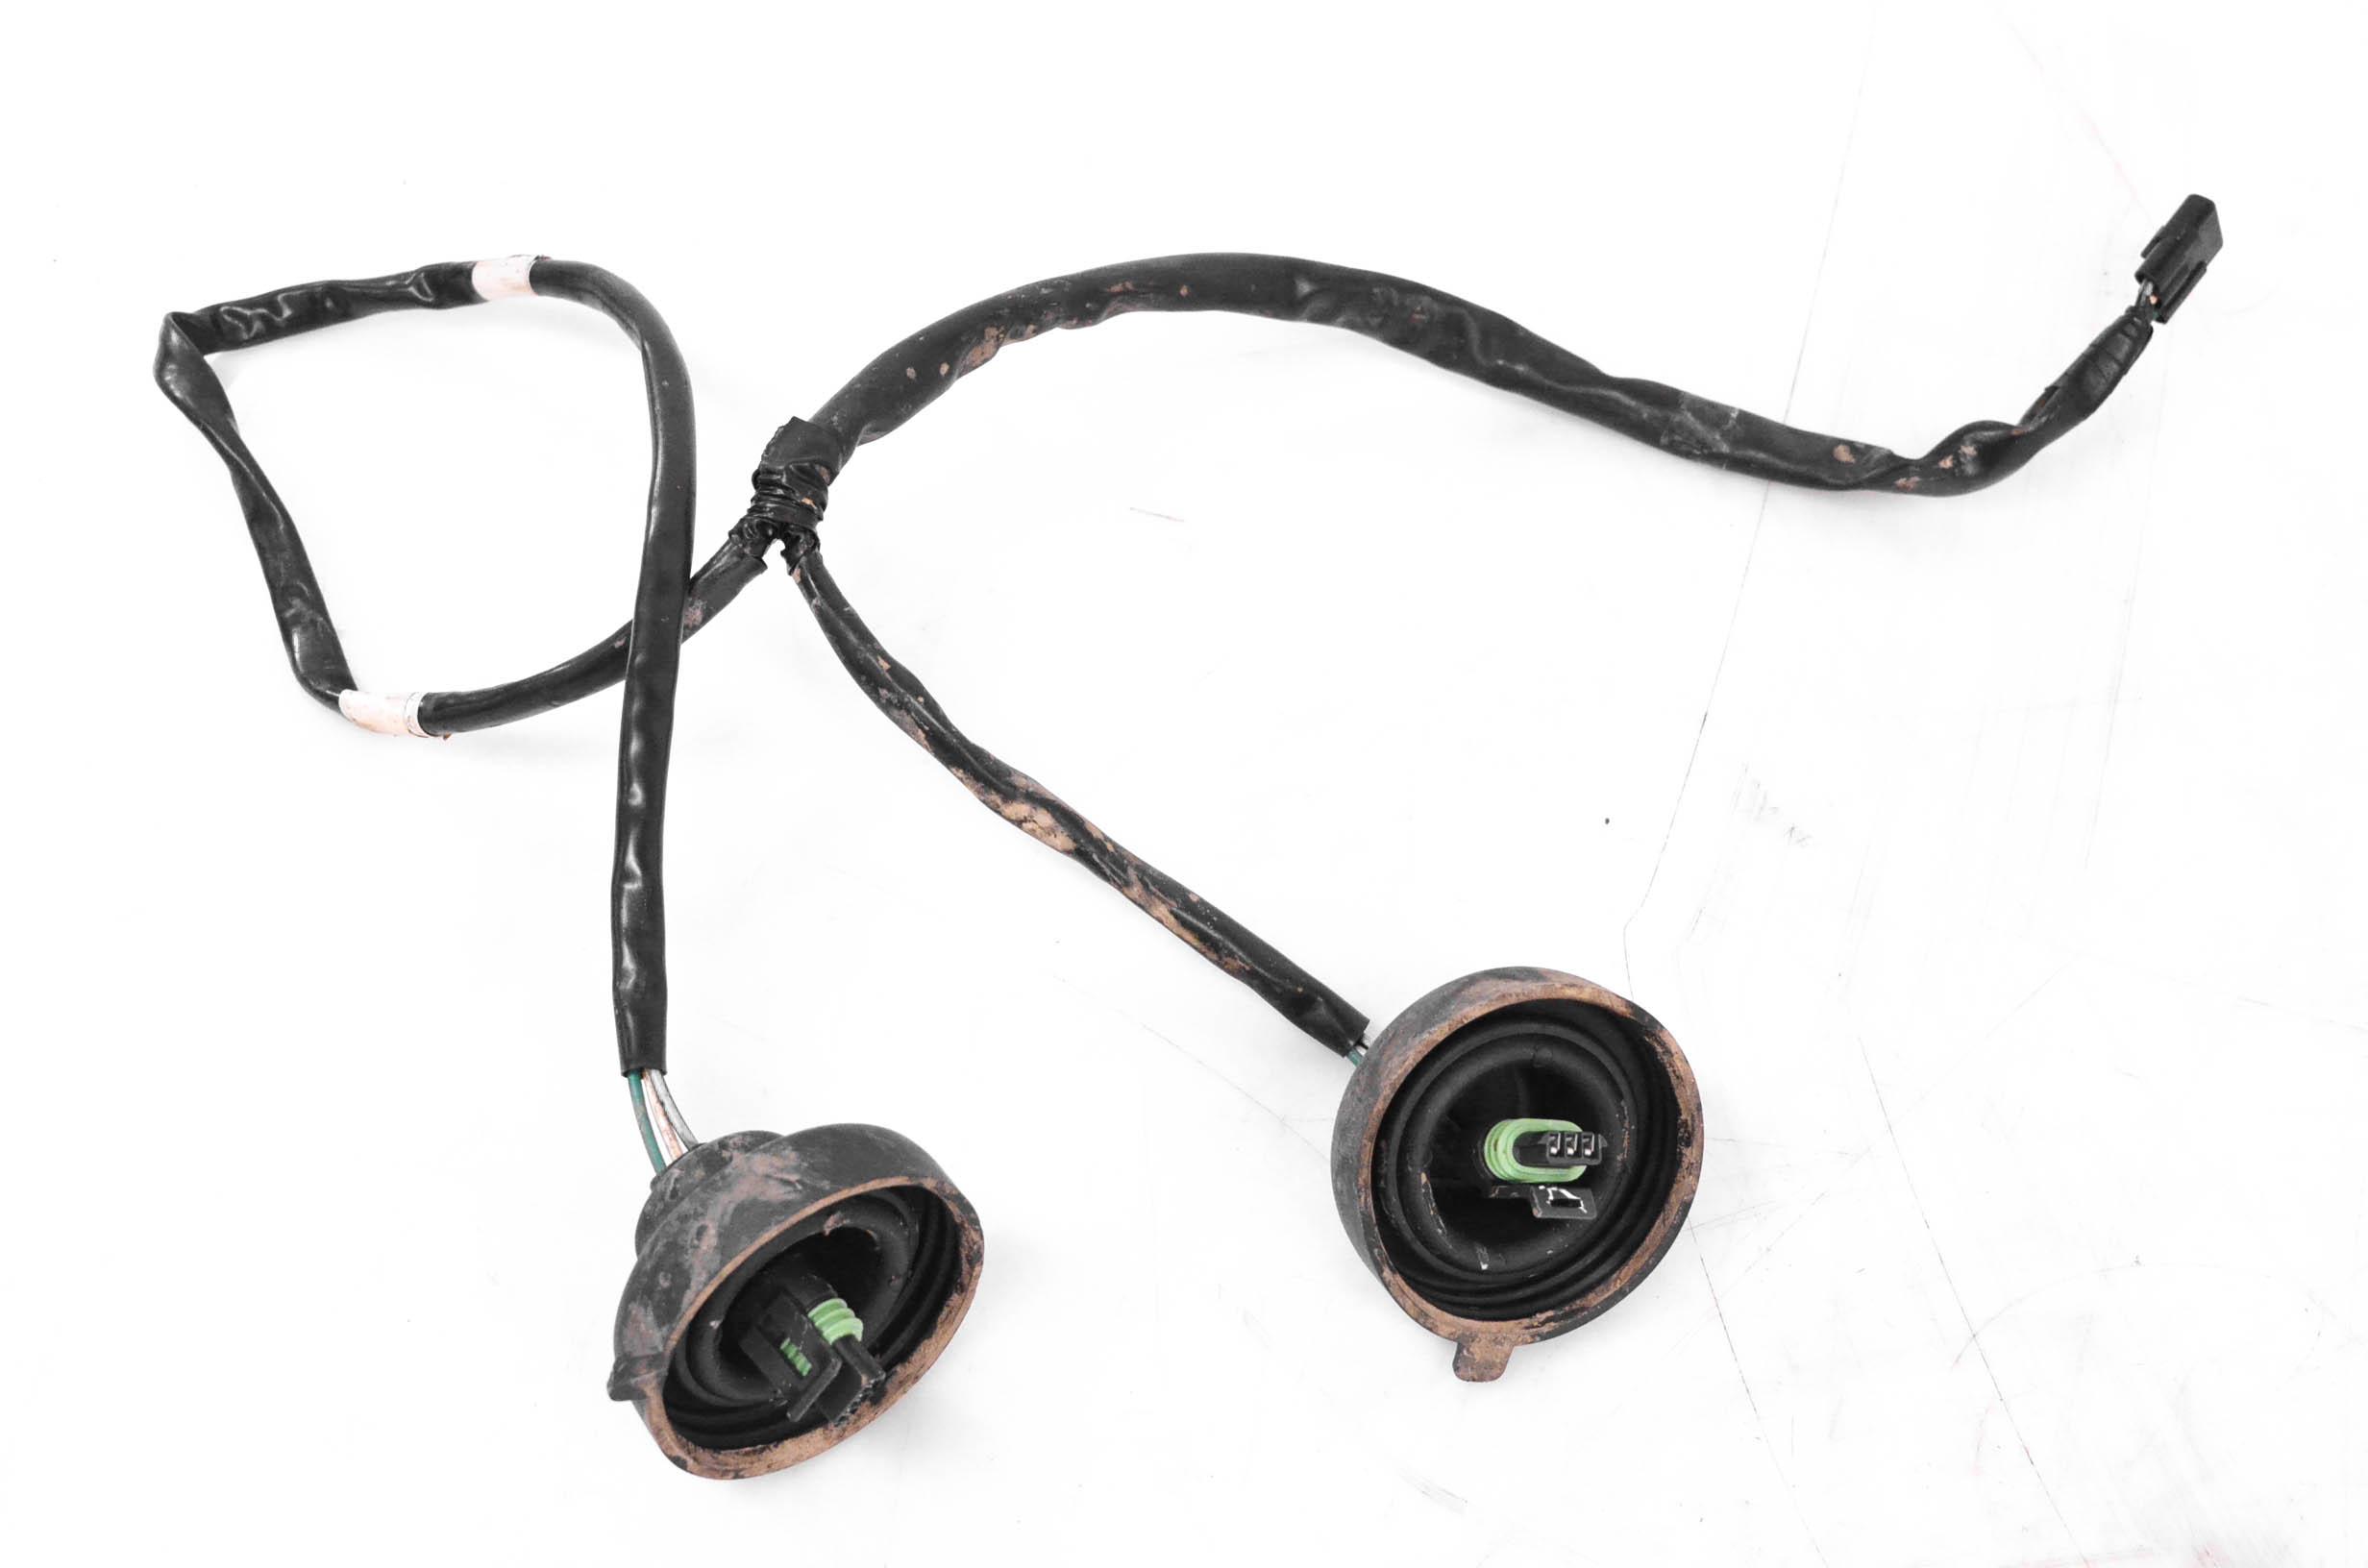 04 Honda Rancher 350 4x4 Front Headlight Sockets Harness